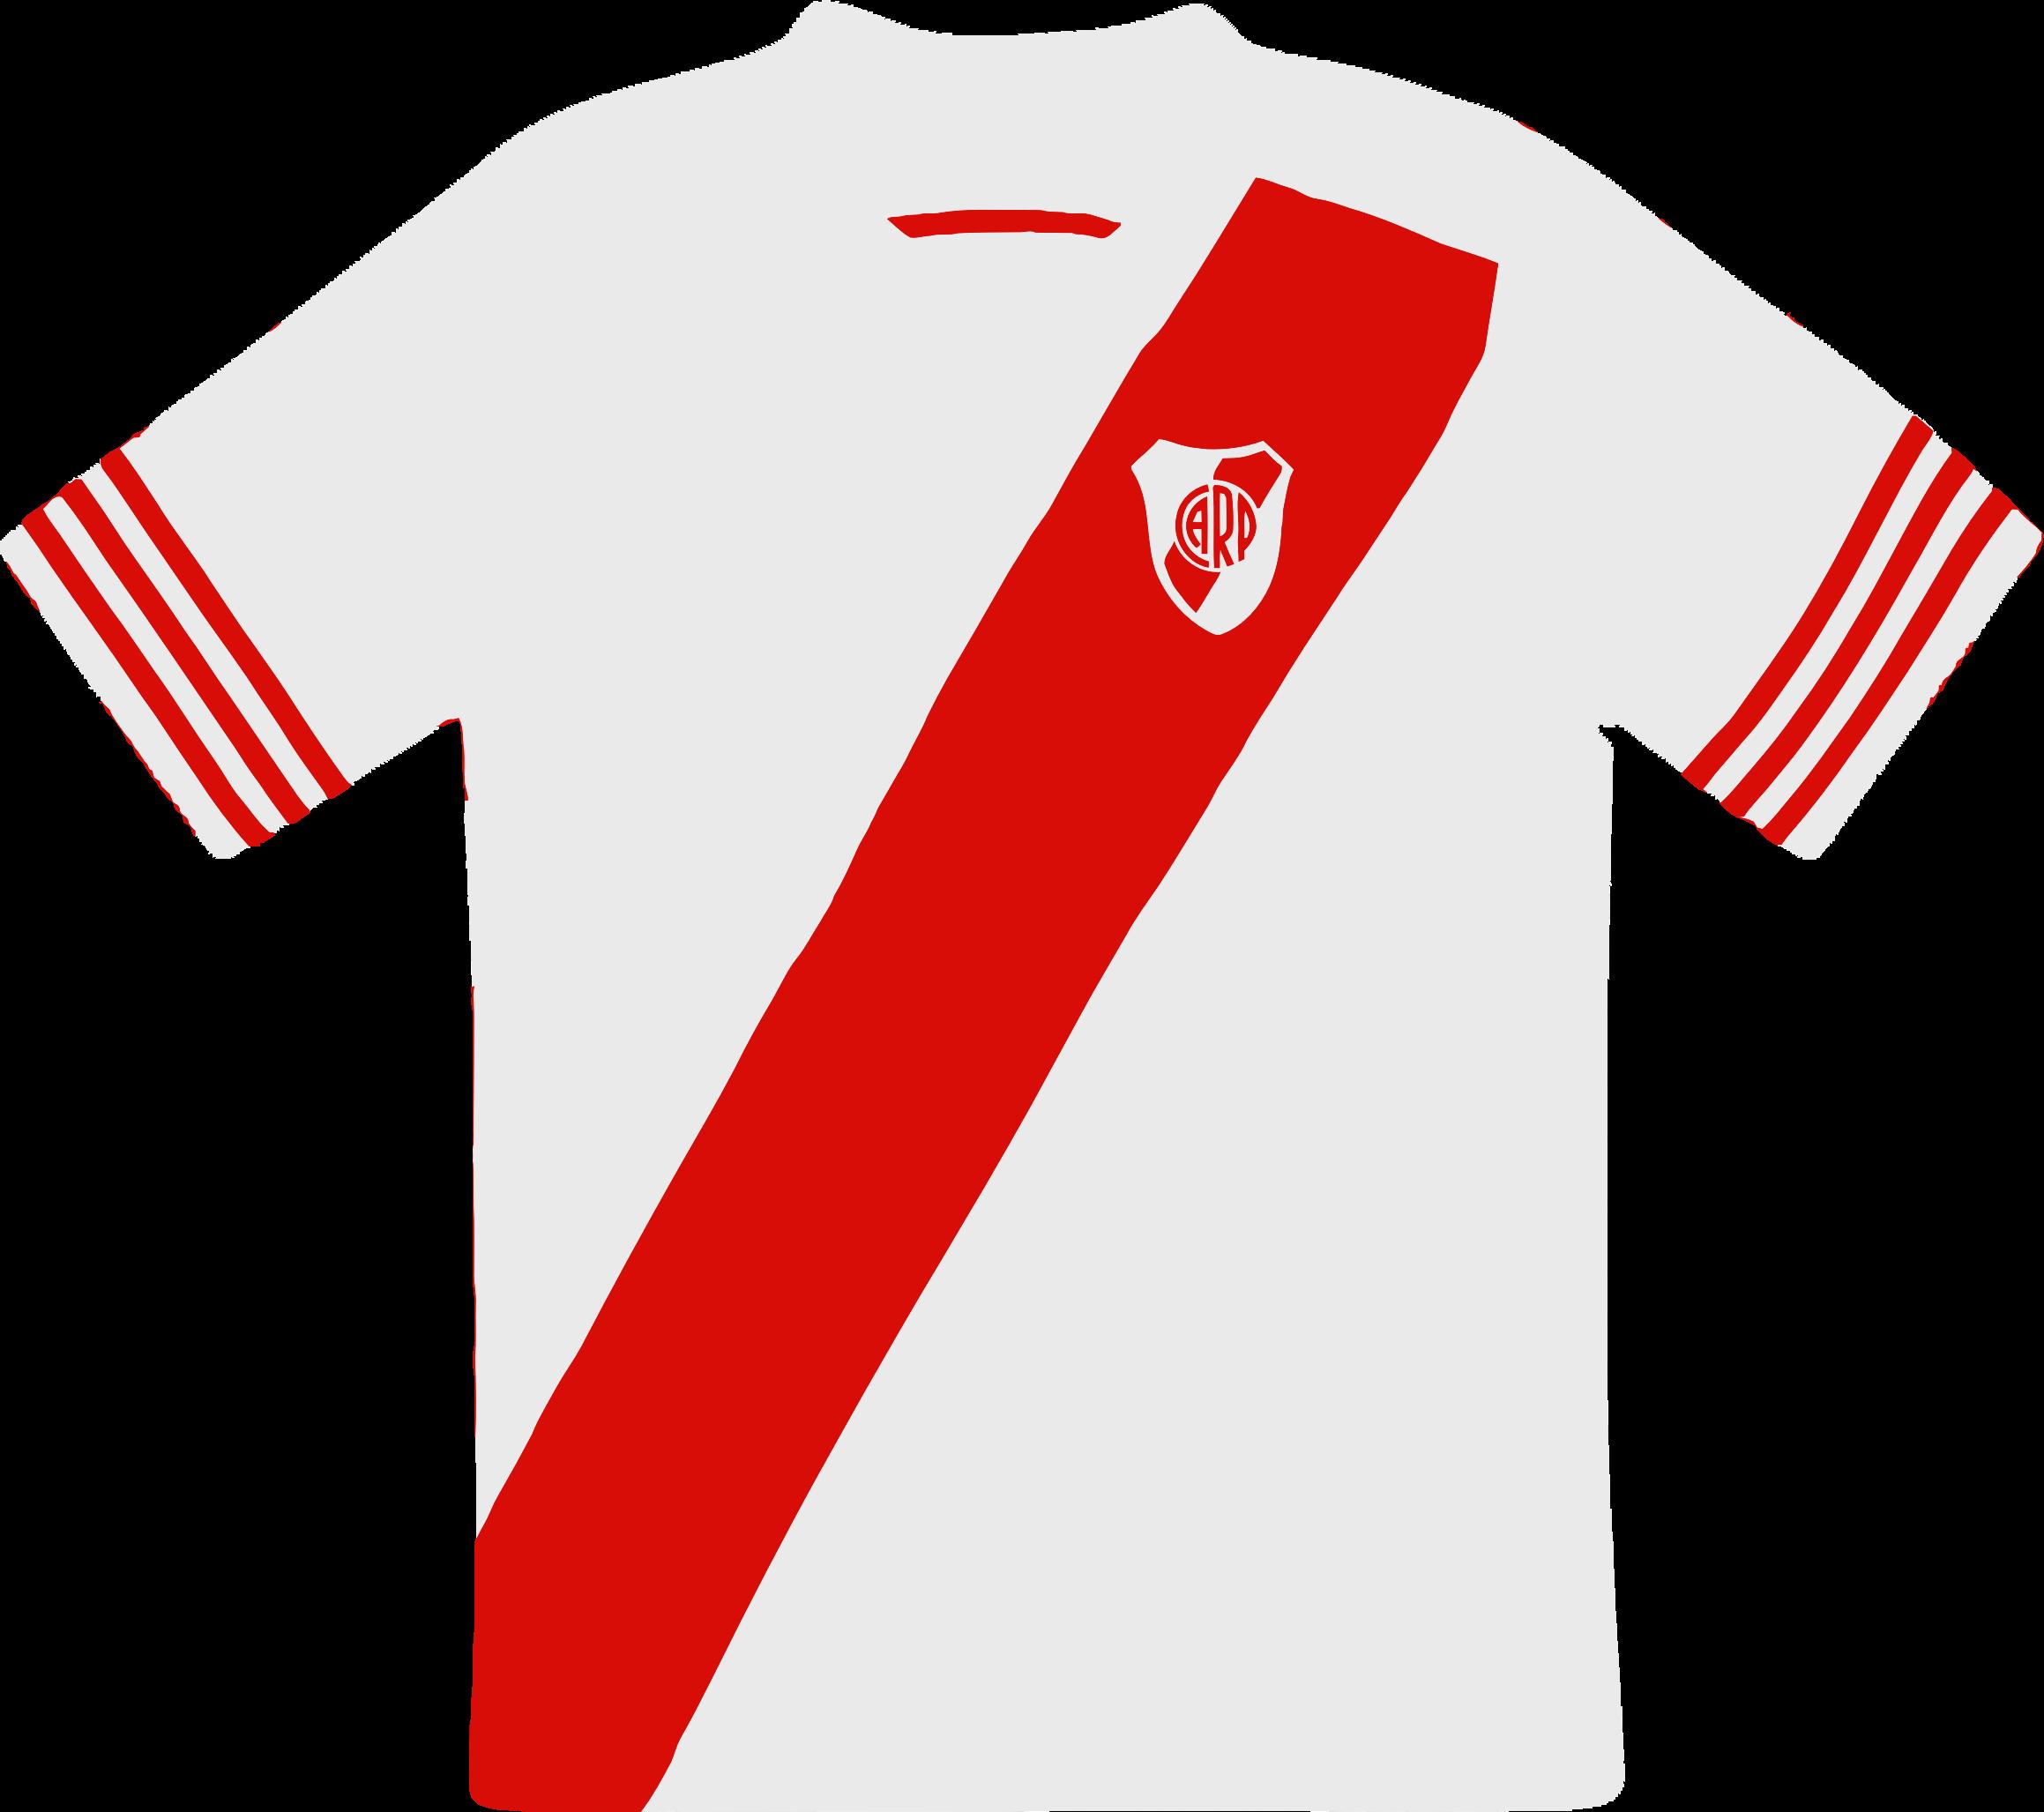 Clipart River Plate Camiseta - Camiseta De River Plate Sin P